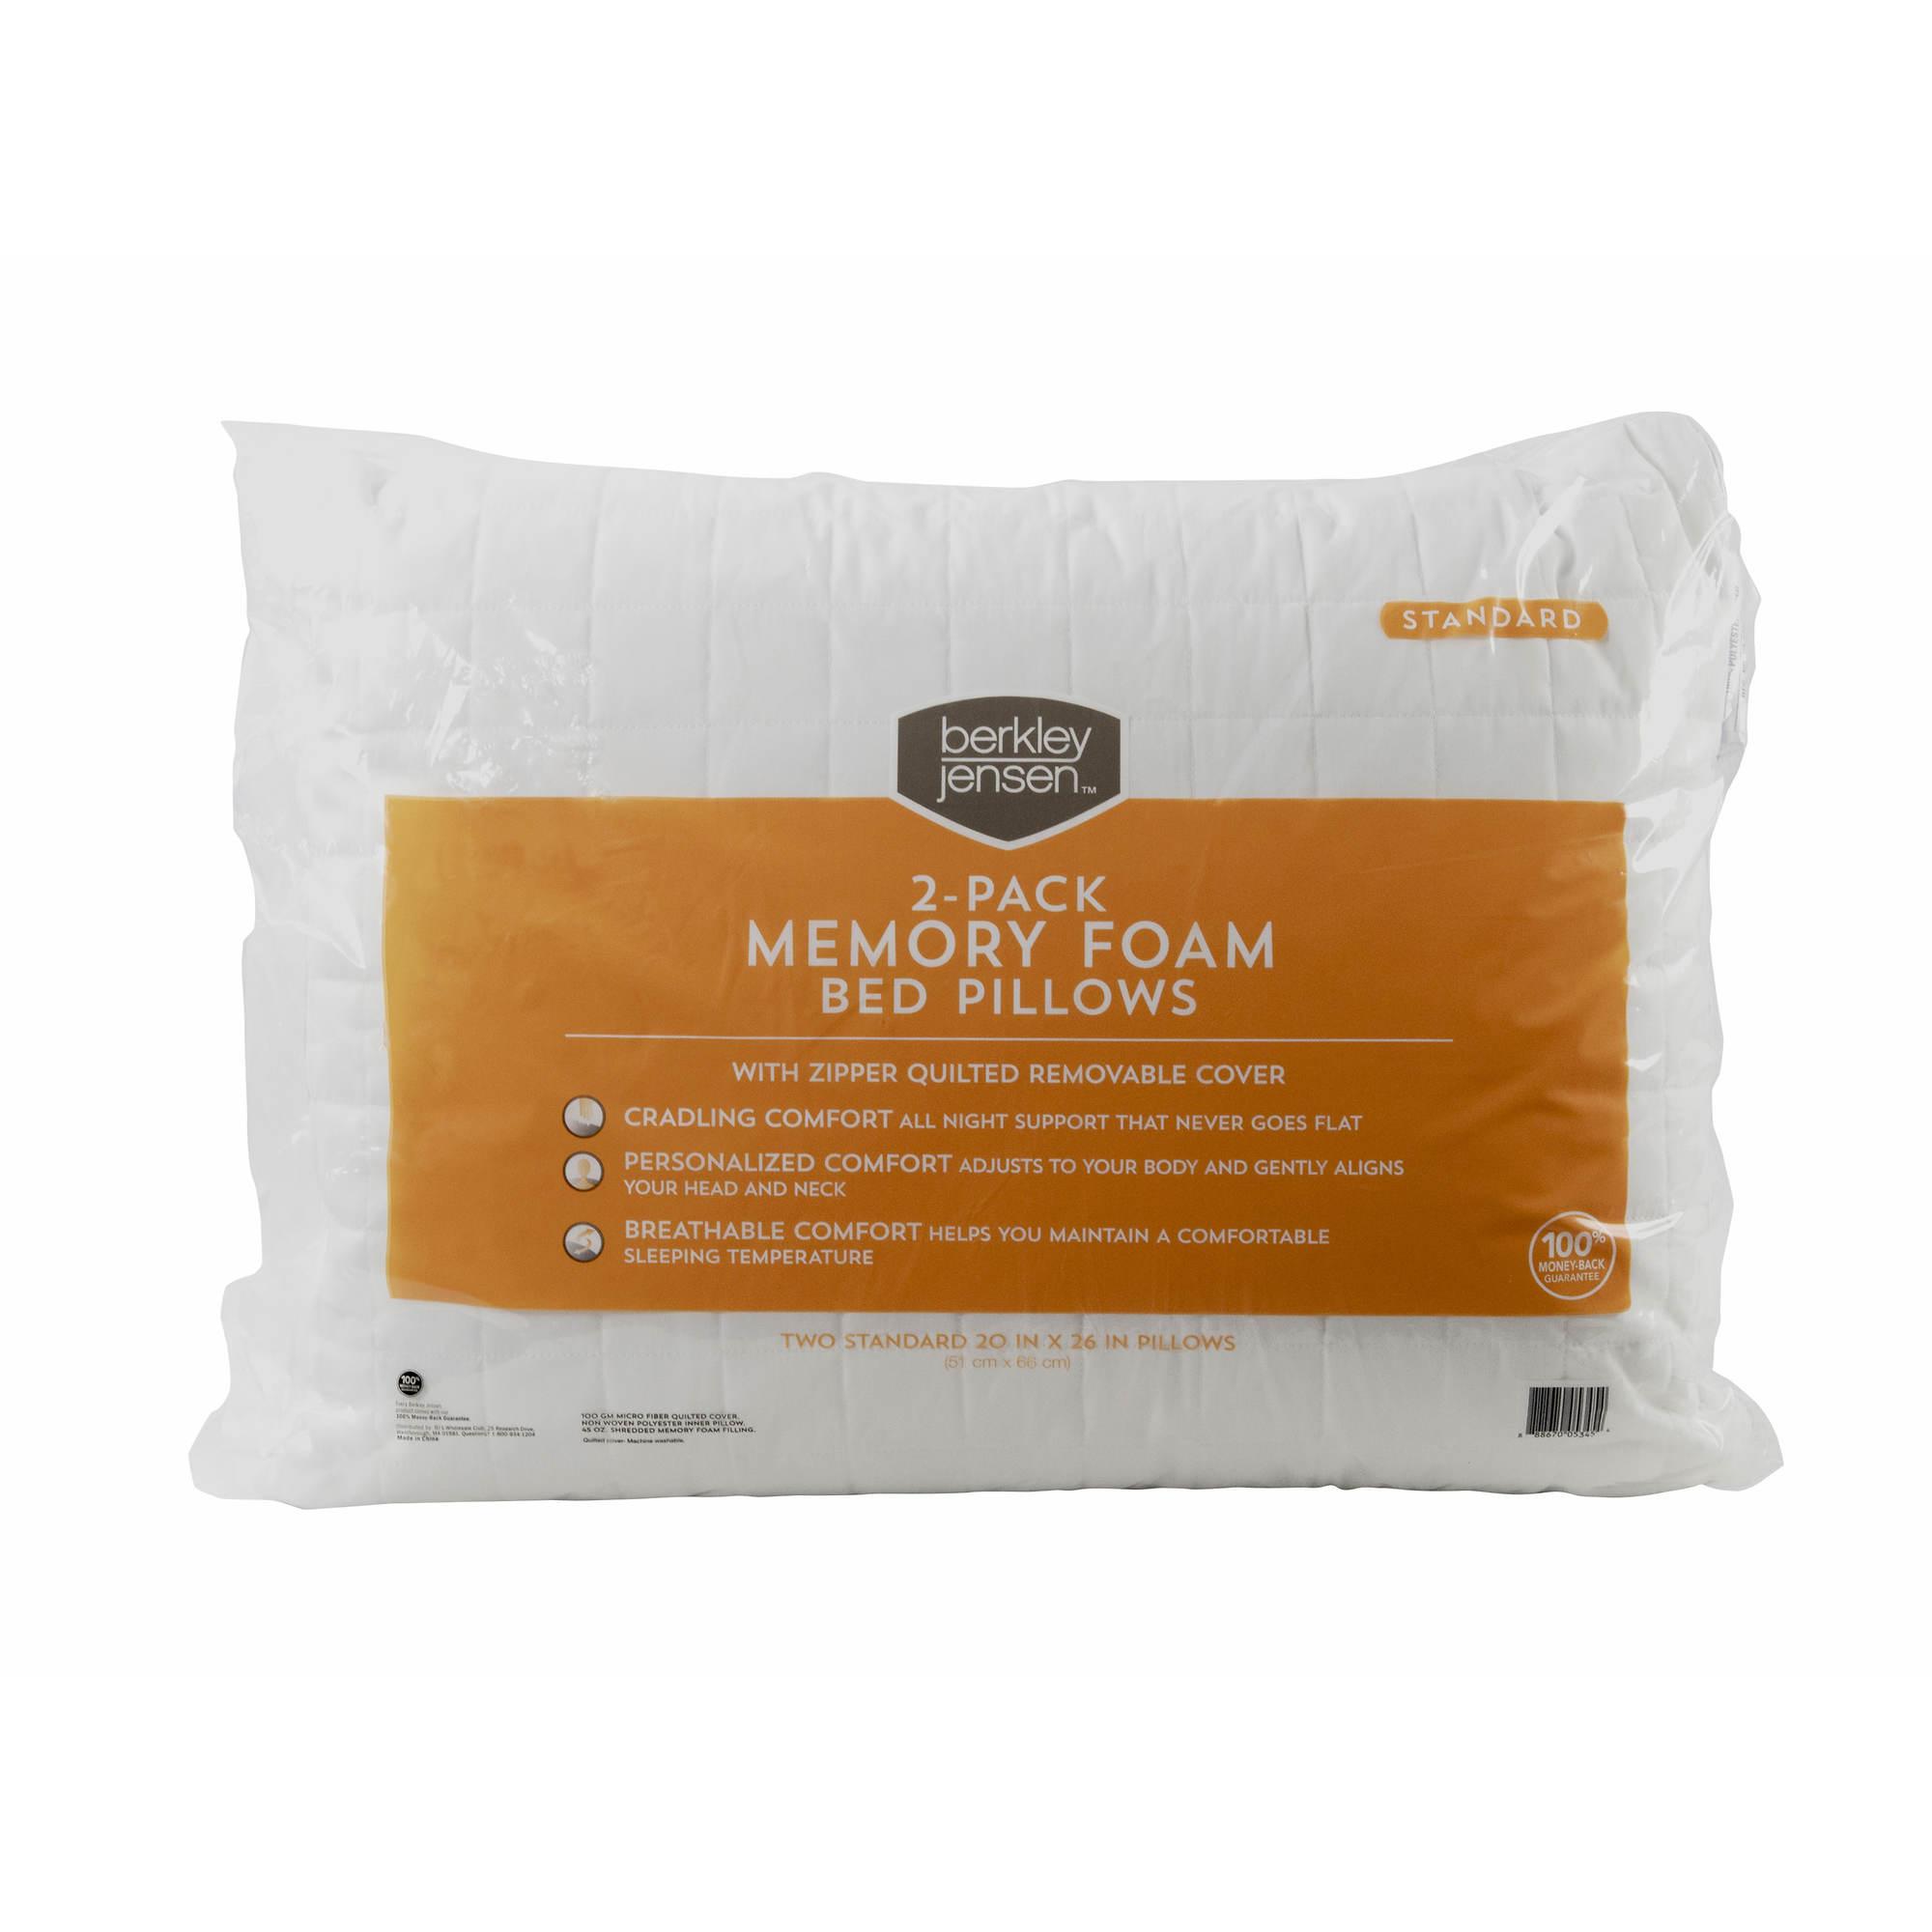 Berkley Jensen Standard-Size Memory Foam Pillow, 2 pk. - BJs ...